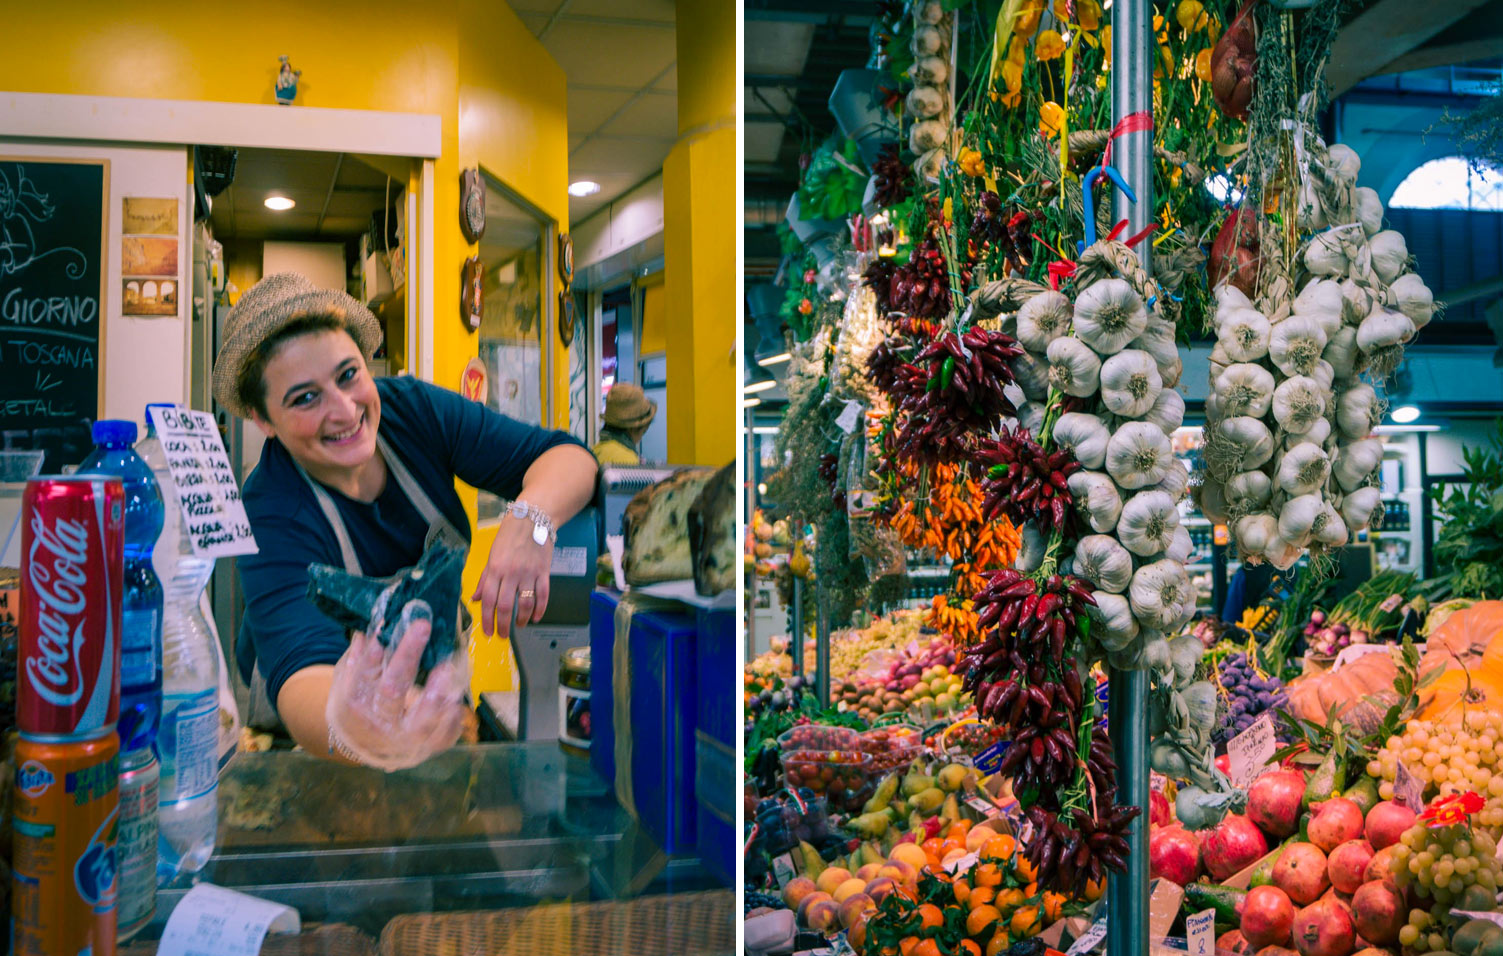 Saluhallen Mercato Centrale i Florens